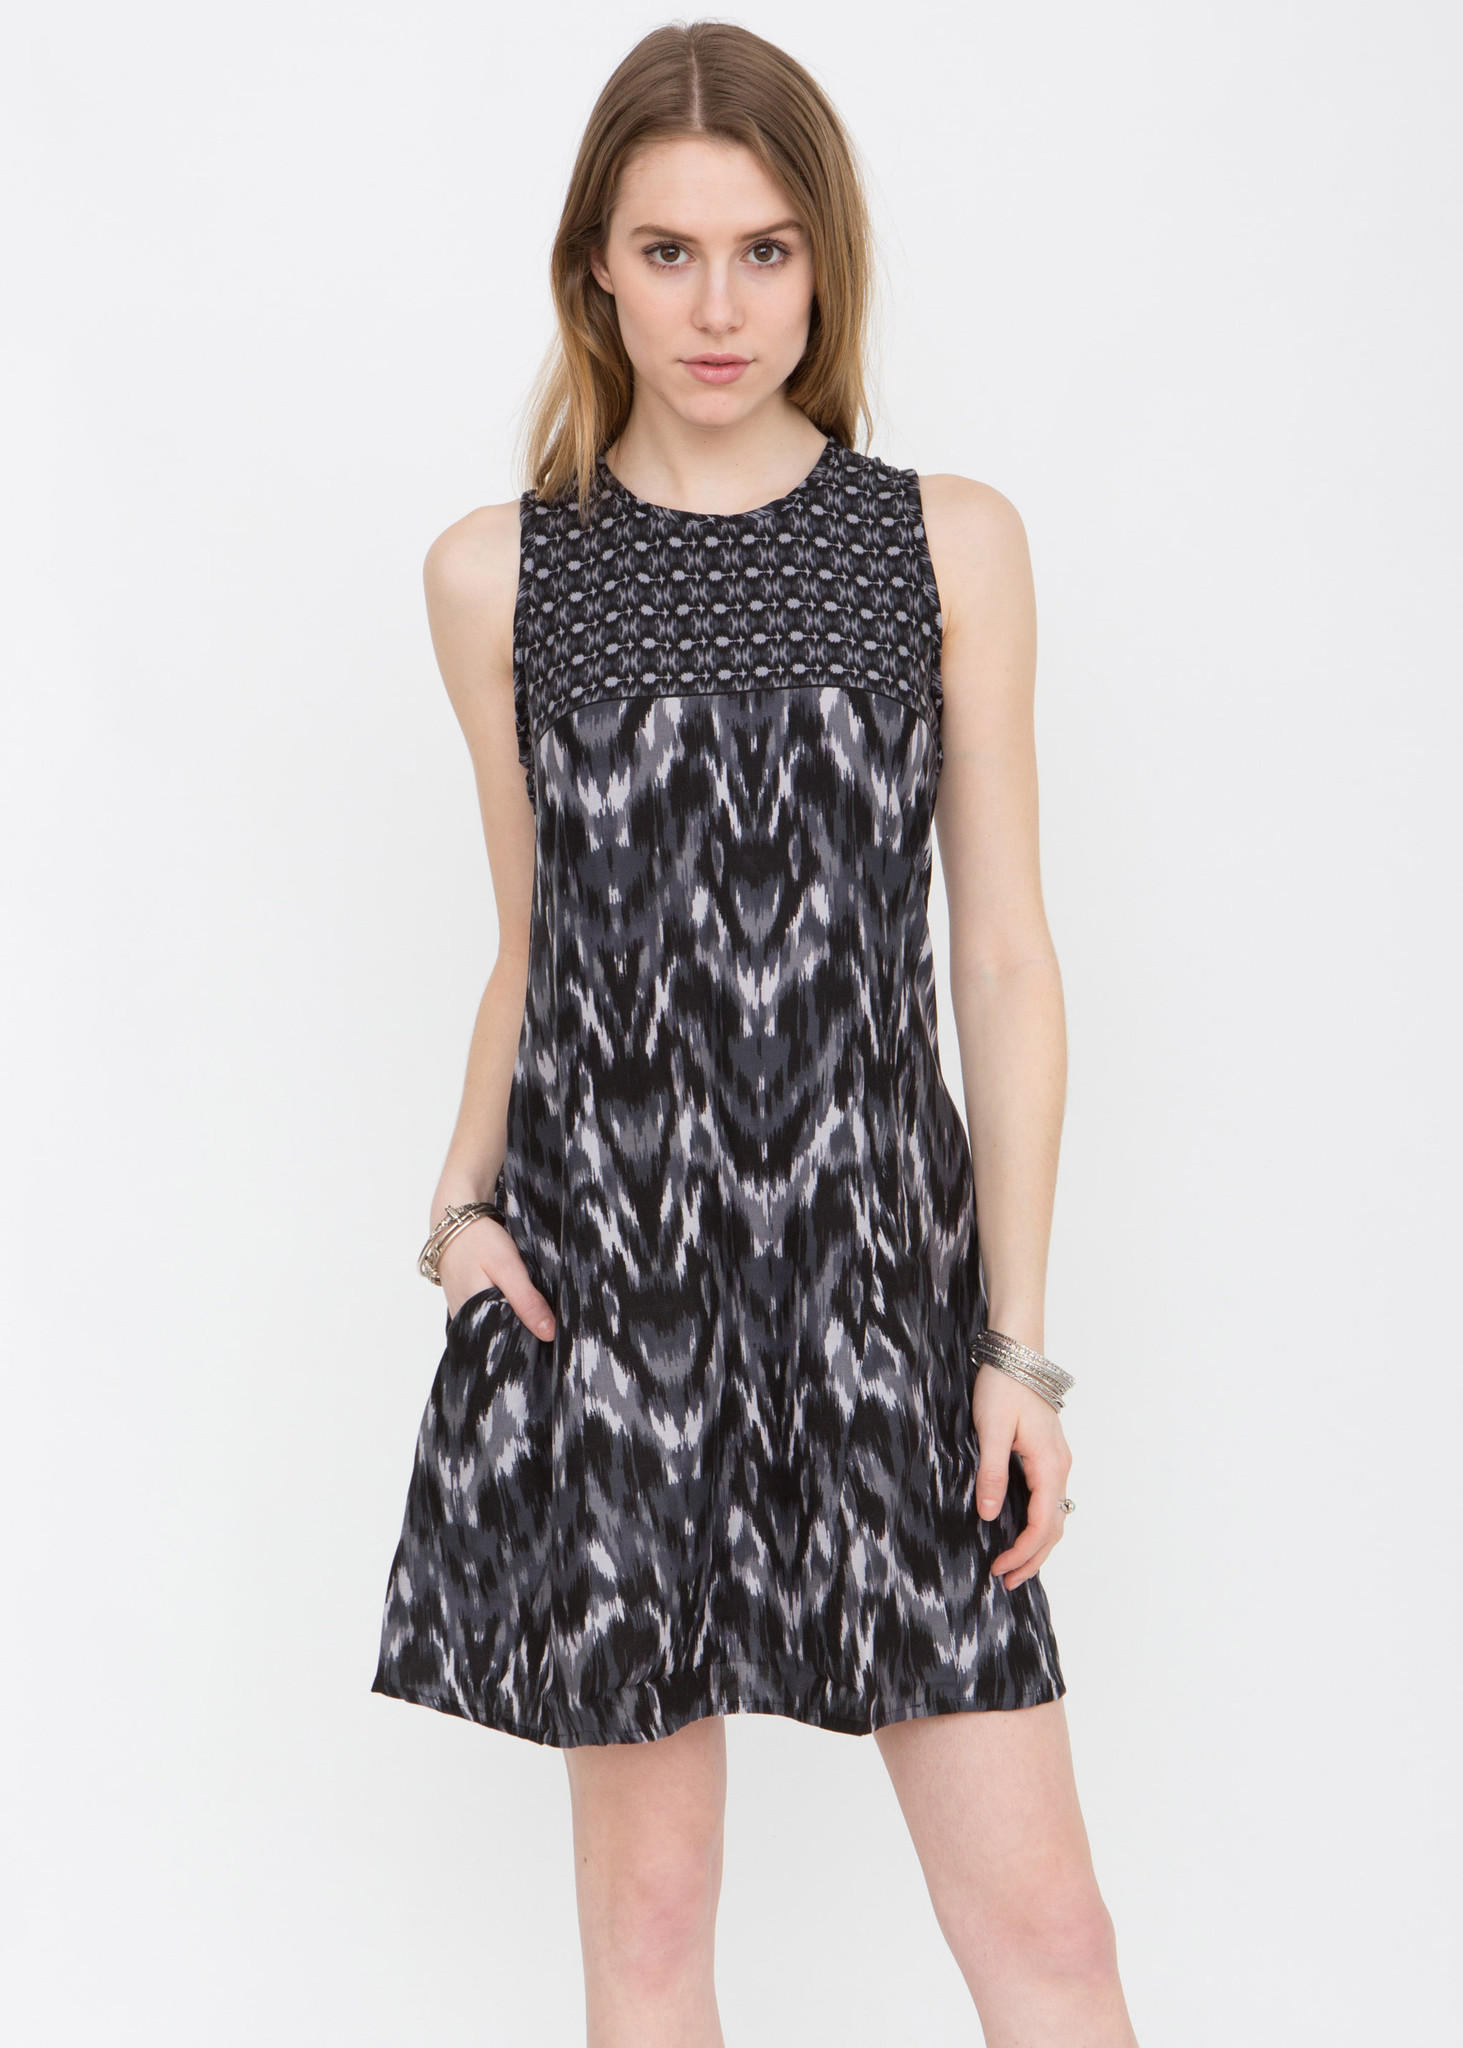 c96fddf2cfdd2f Adjustable Back Shift Dress in Grey Mix Print - likemary